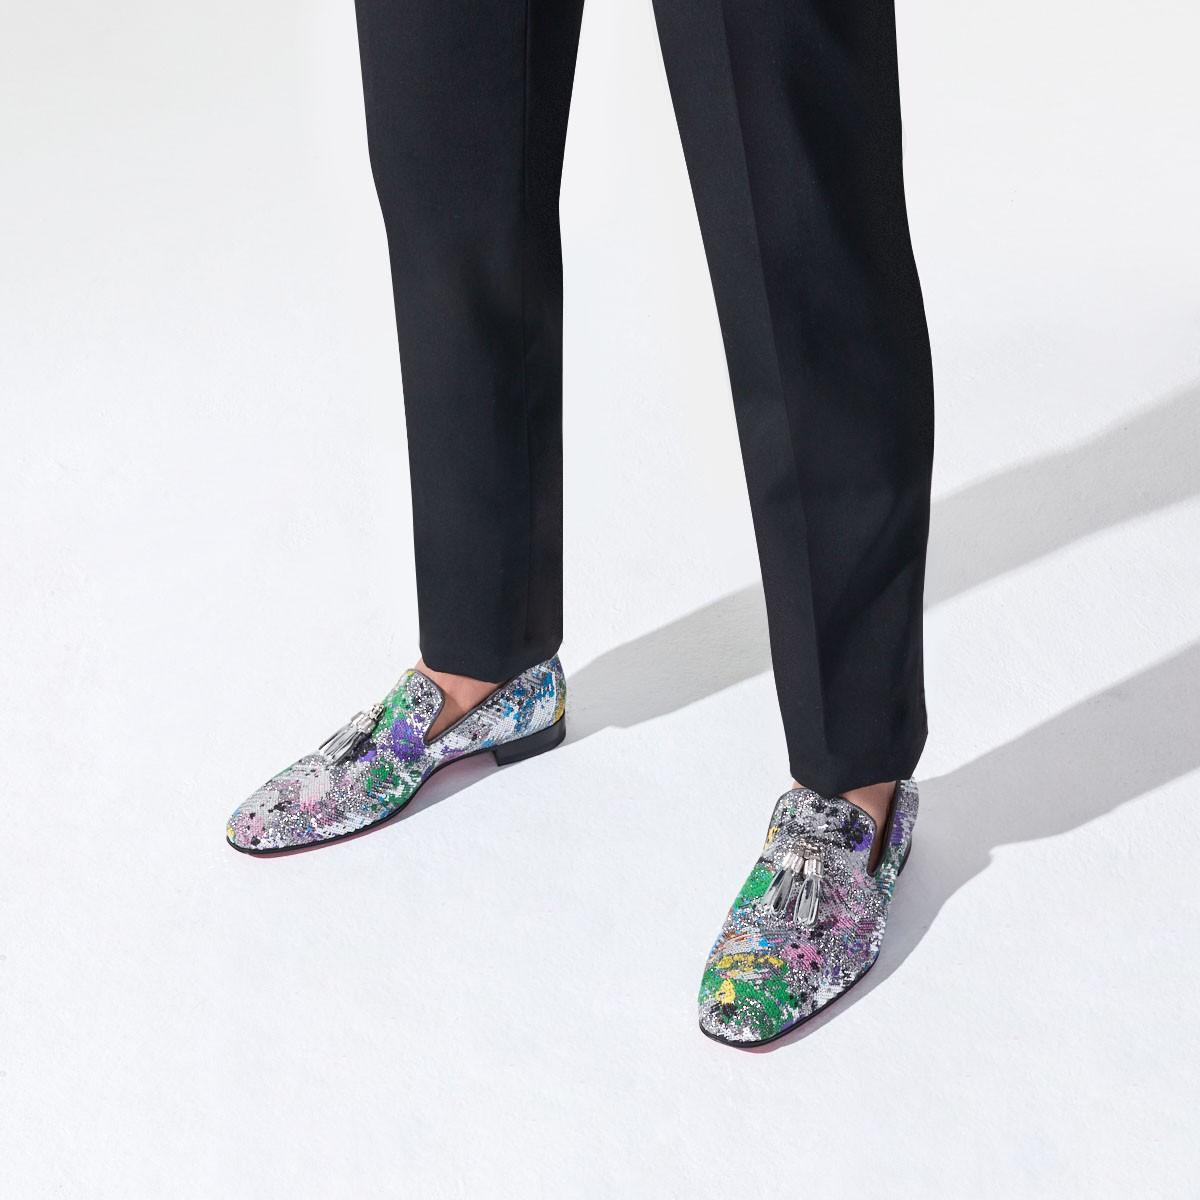 Shoes - Rivalion - Christian Louboutin